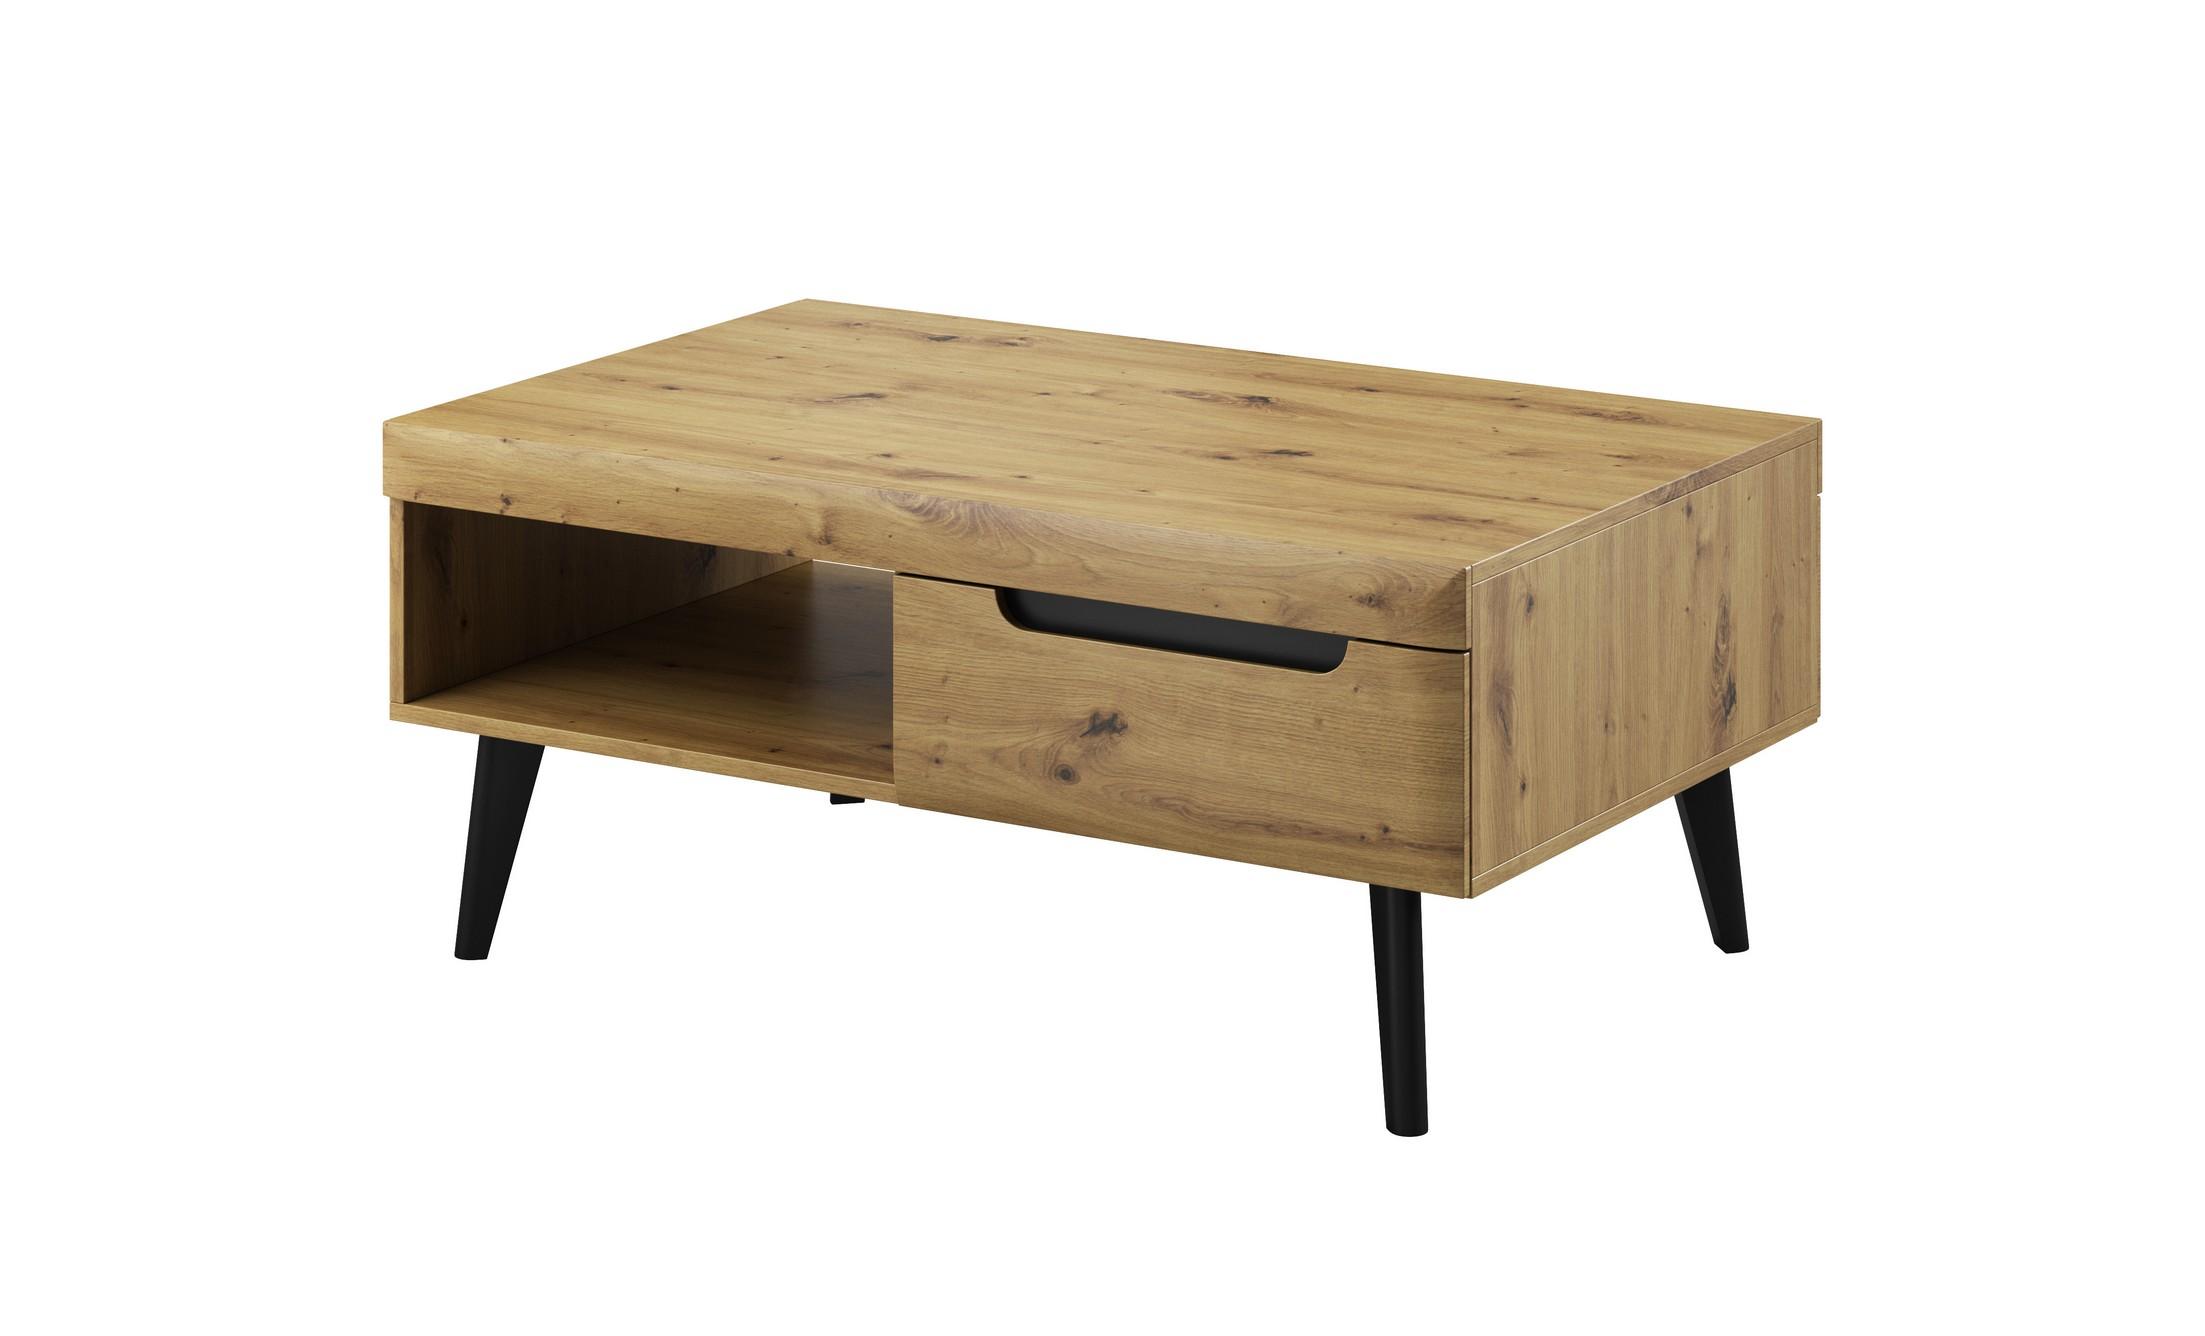 Piaski Konferenčný stolík Nordi NL107 Farba: Dub artisan